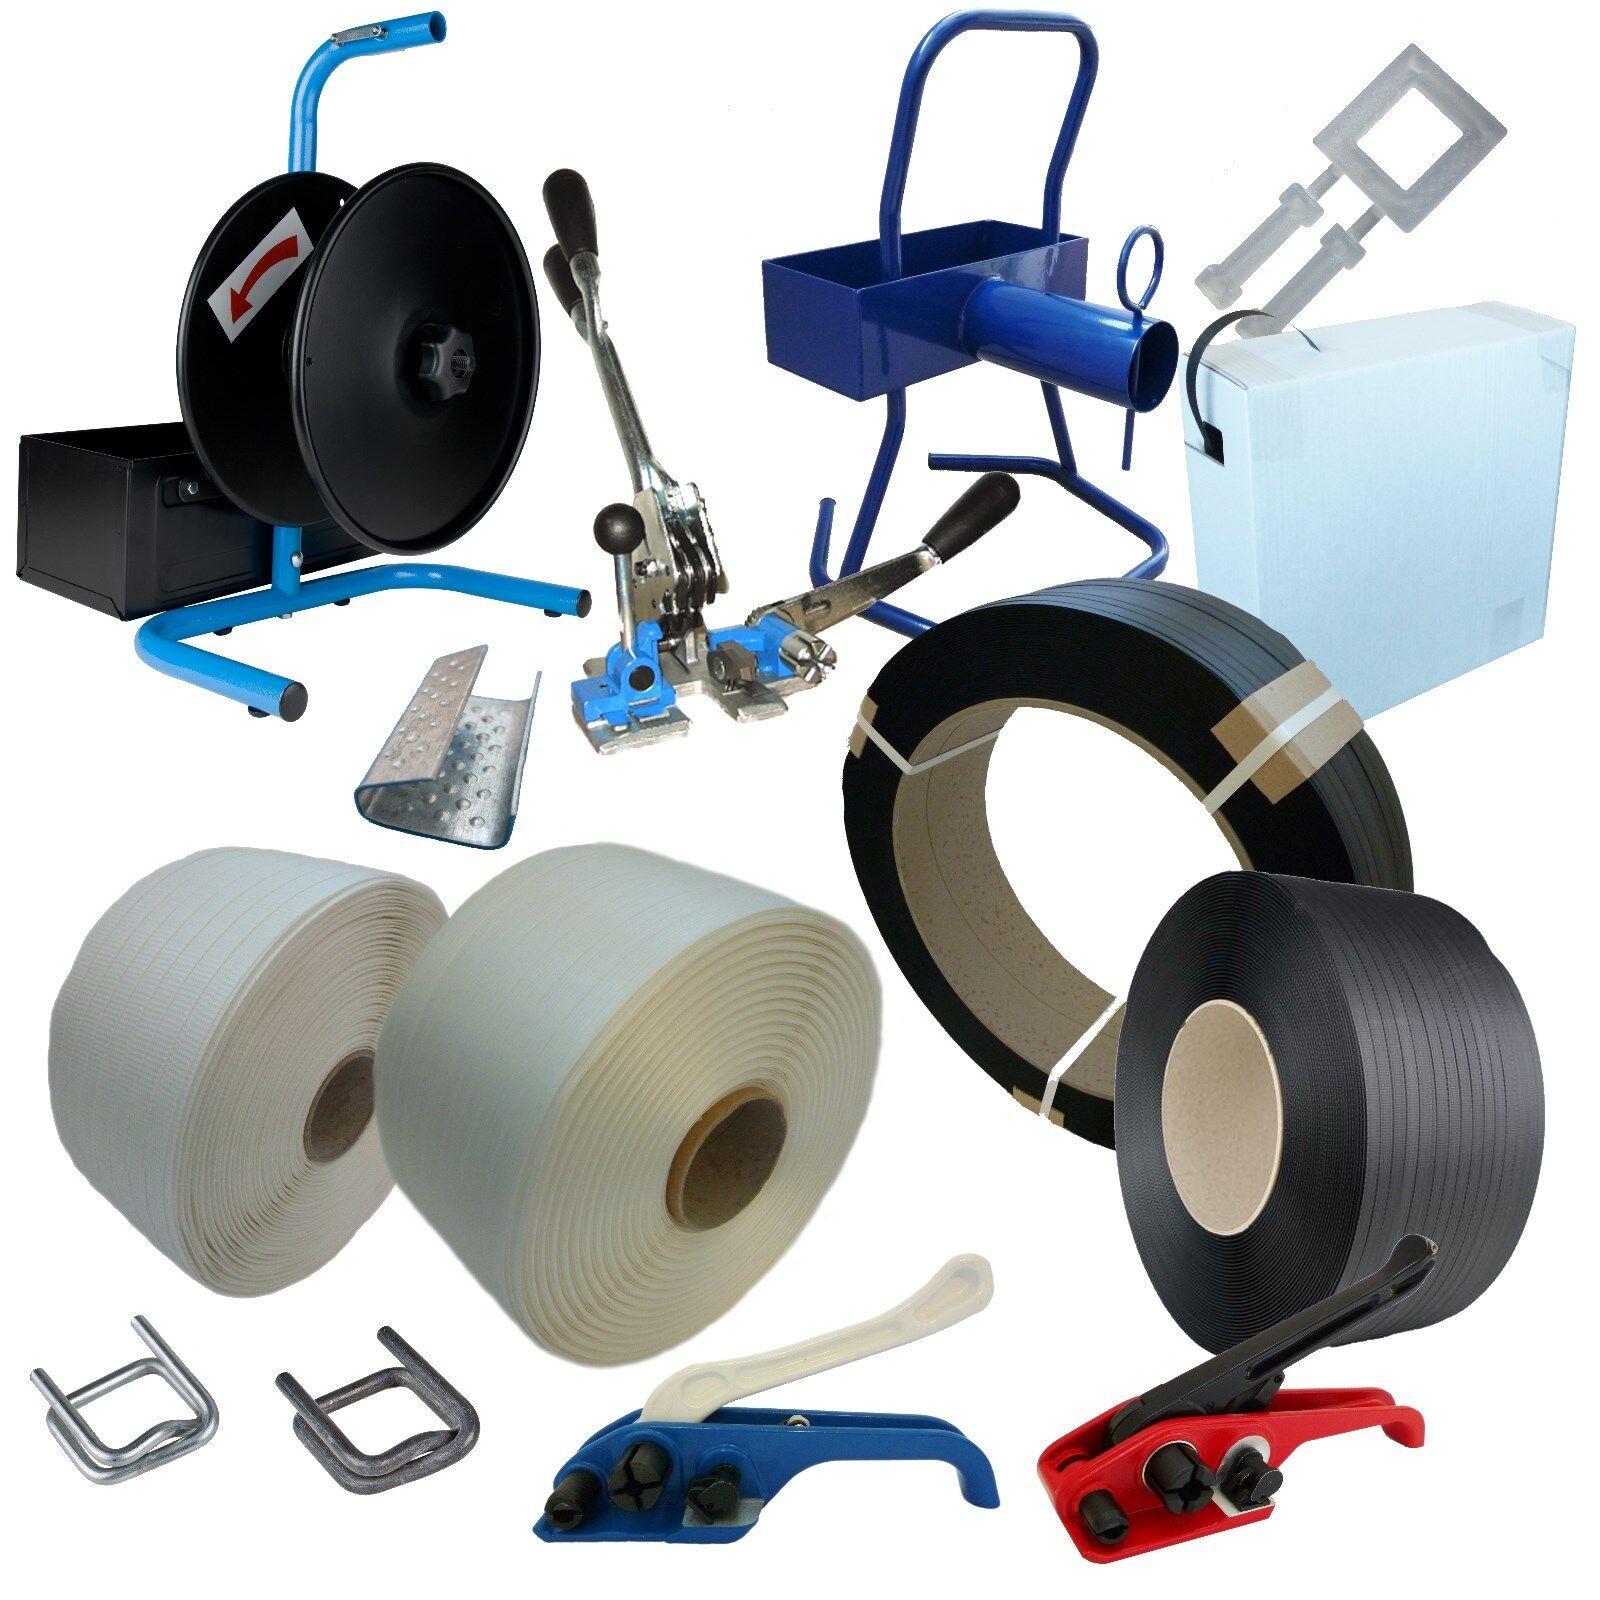 Textil Umreifungsband -PP -gewebt Abrollgerät Bandspanner Klemmen